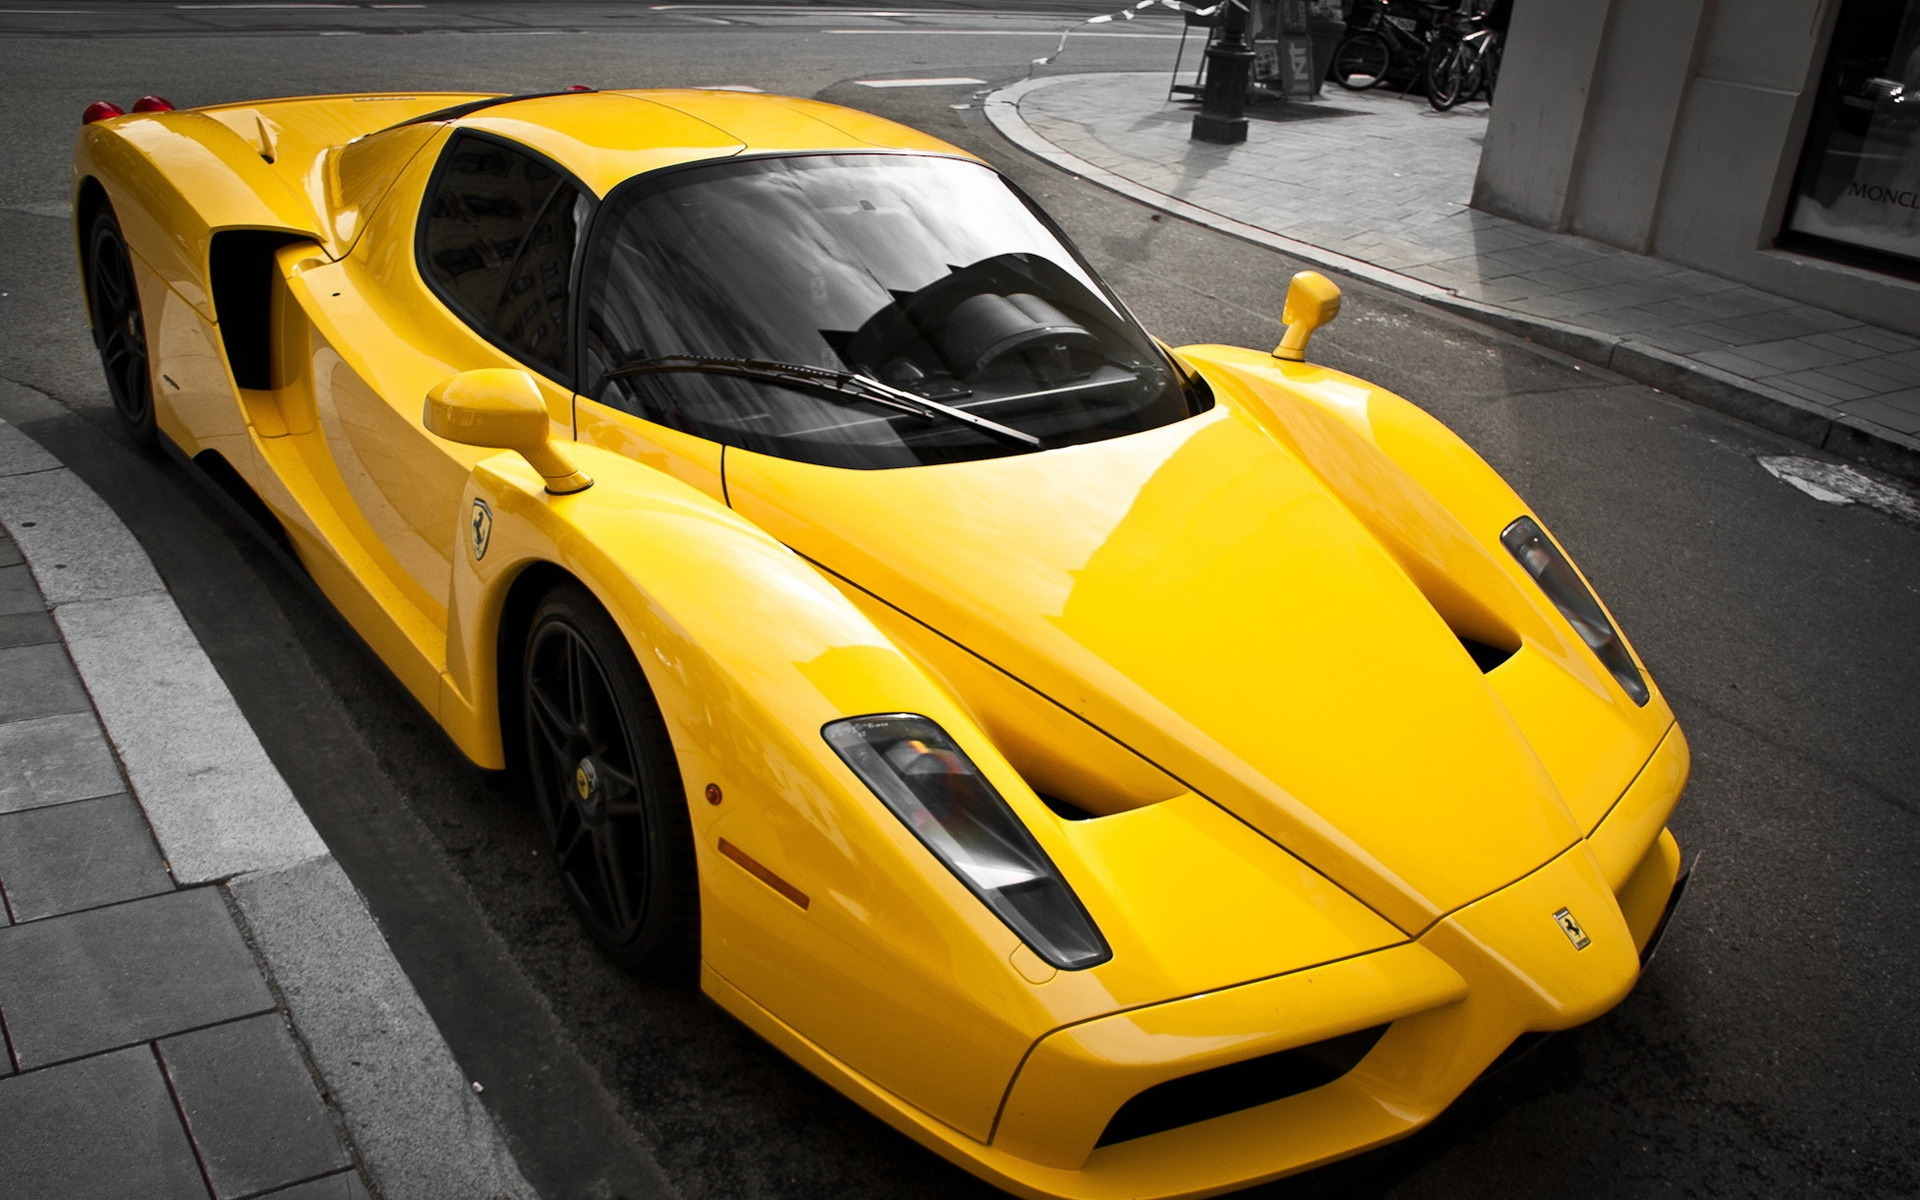 yellow car 2015 09 - photo #4